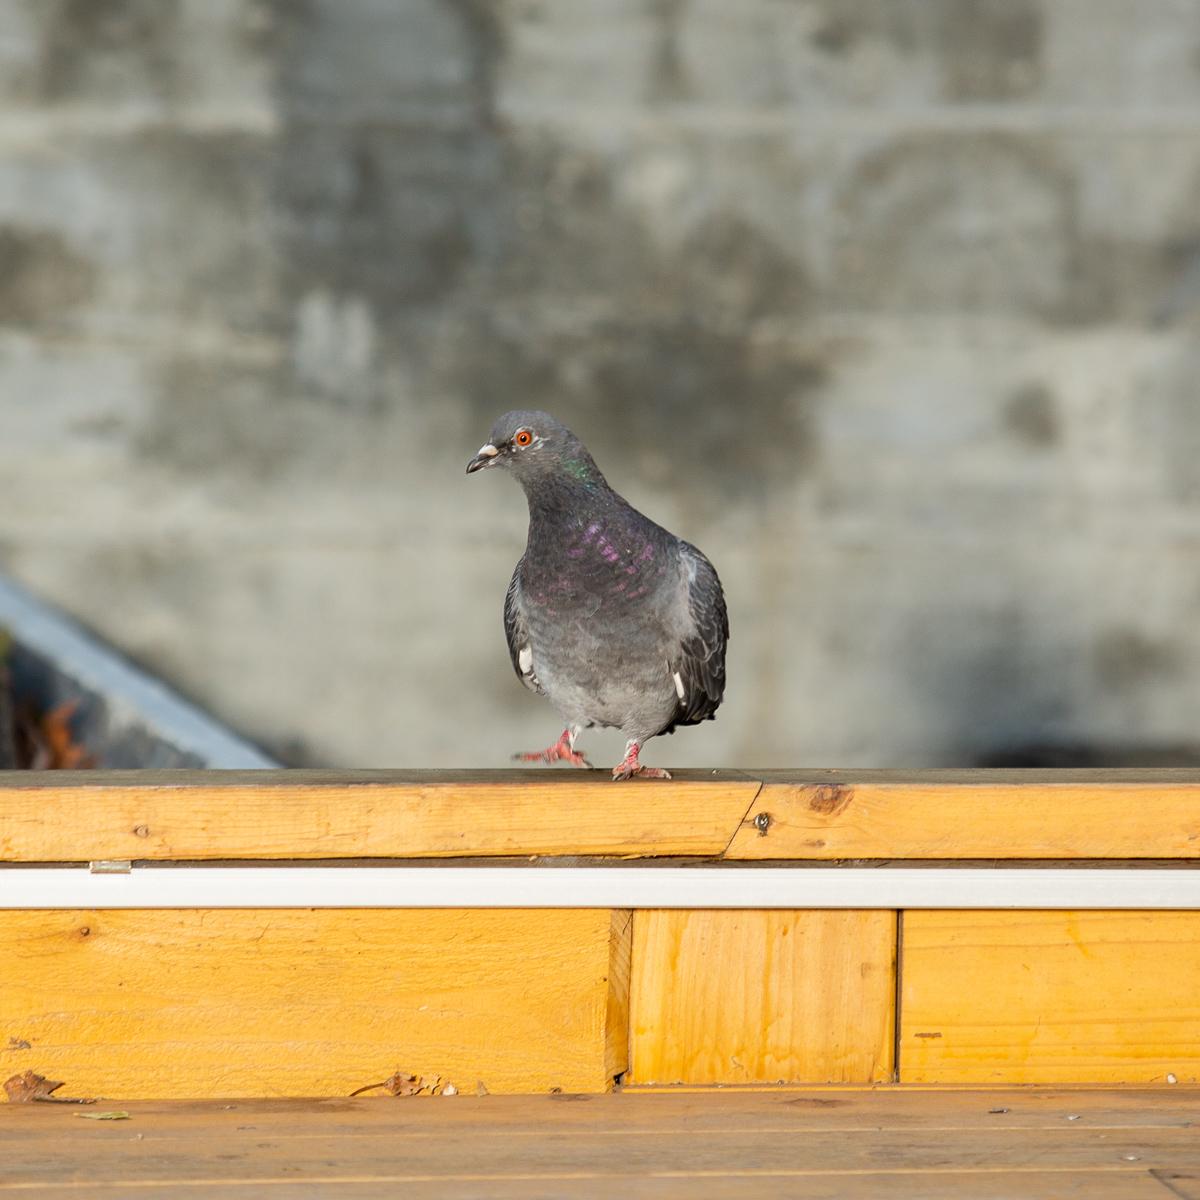 Black Sign - it's bird-Onbody-5760 x 3840-18.jpg